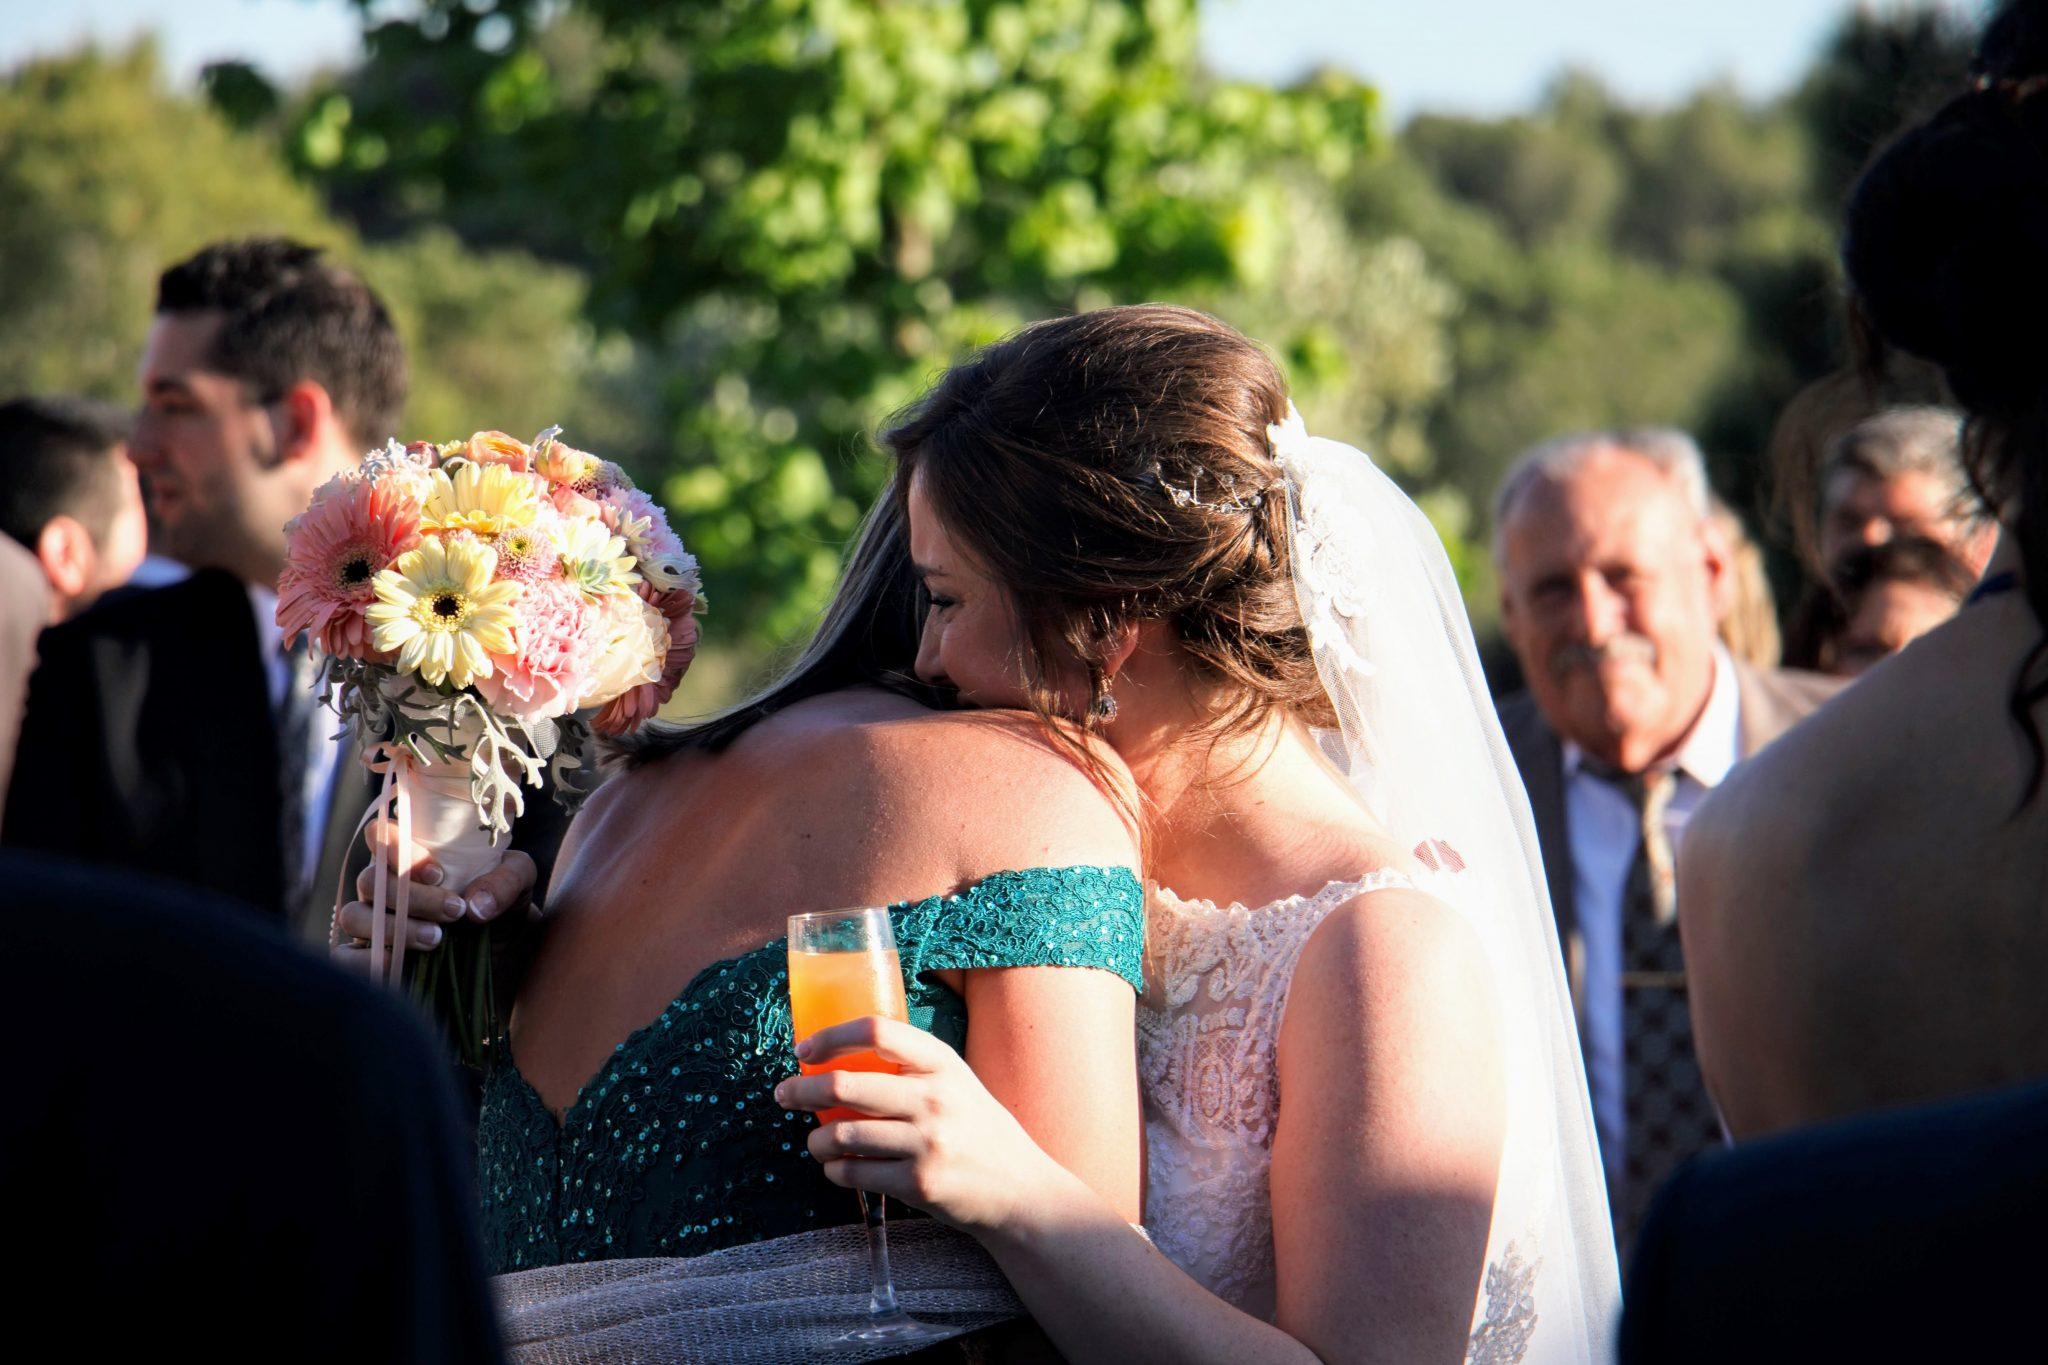 Mas de Can Riera, fotografo bodas barcelona | fotografo de bodas en barcelona | fotografo de bodas barcelona | fotografia bodas barcelona | fotografo boda barcelona | fotograf casaments barcelona | fotografos bodas barcelona | contratar fotografos barcelona | contratar fotografos en barcelona | fotógrafos bodas barcelona | fotografia boda barcelona | fotografo bodas barato | fotografo barato barcelona | reportaje de bodas barcelona | fotografía de bodas barcelona girona | fotografos de bodas barcelona | fotografos de boda en barcelona | fotografos barcelona bodas | fotógrafo bodas barcelona | fotografo bodas girona | fotografo bodas tarragona | fotografo bodas lleida | fotografos de bodas en barcelona | fotografo boda barato | fotógrafo para bodas en barcelona | fotografo bodas en barcelona | fotografo de boda barcelona | fotógrafo de bodas en barcelona